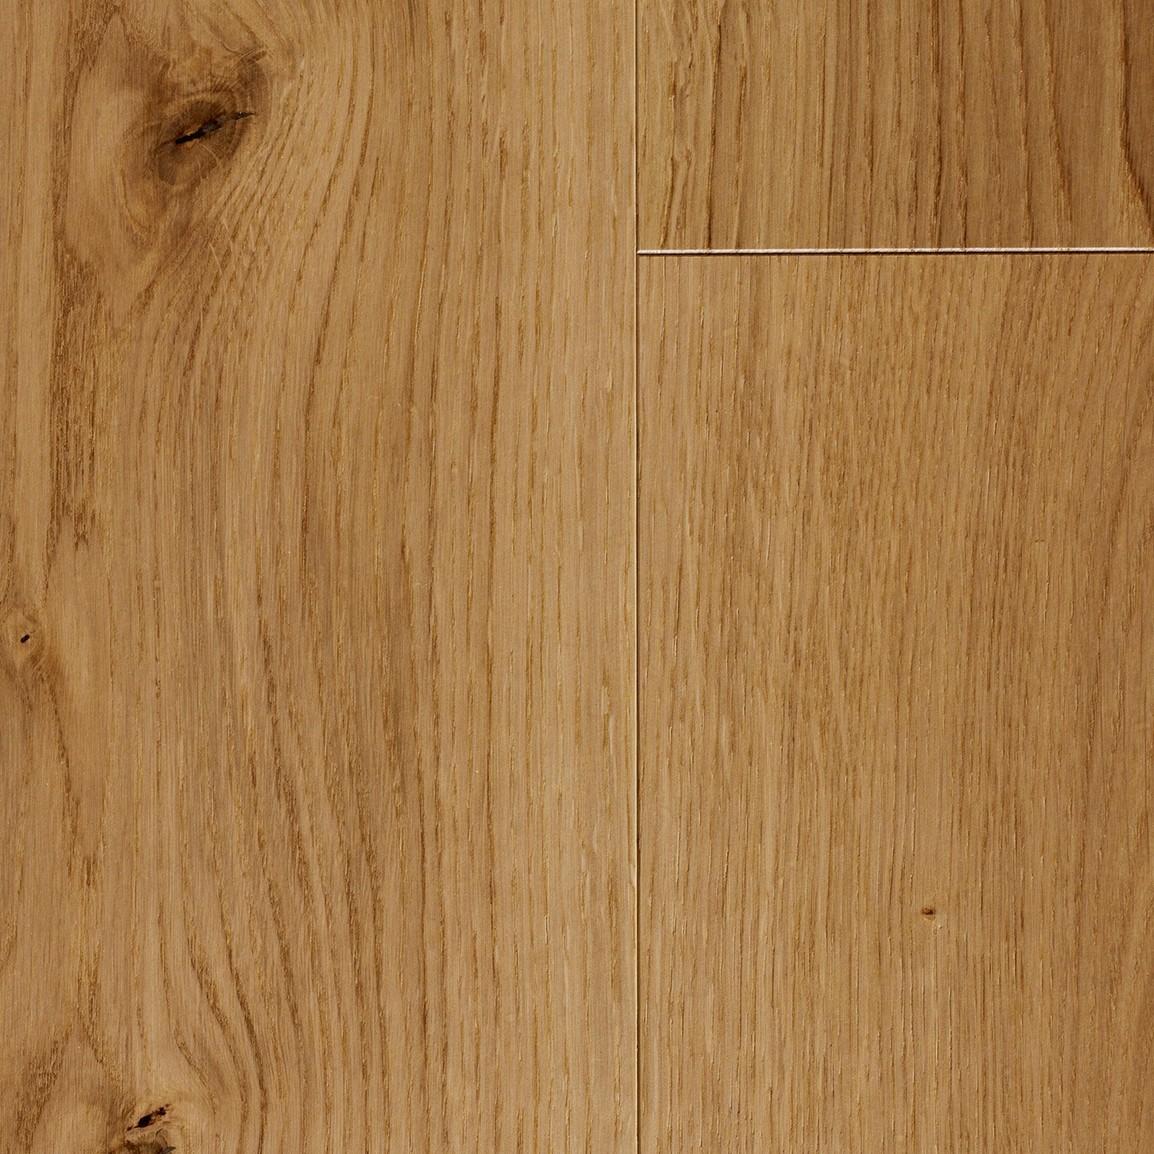 parador parkett classic 3060 landhausdiele 1 stab eiche rustikal m4v lackversiegelt matt parkett. Black Bedroom Furniture Sets. Home Design Ideas